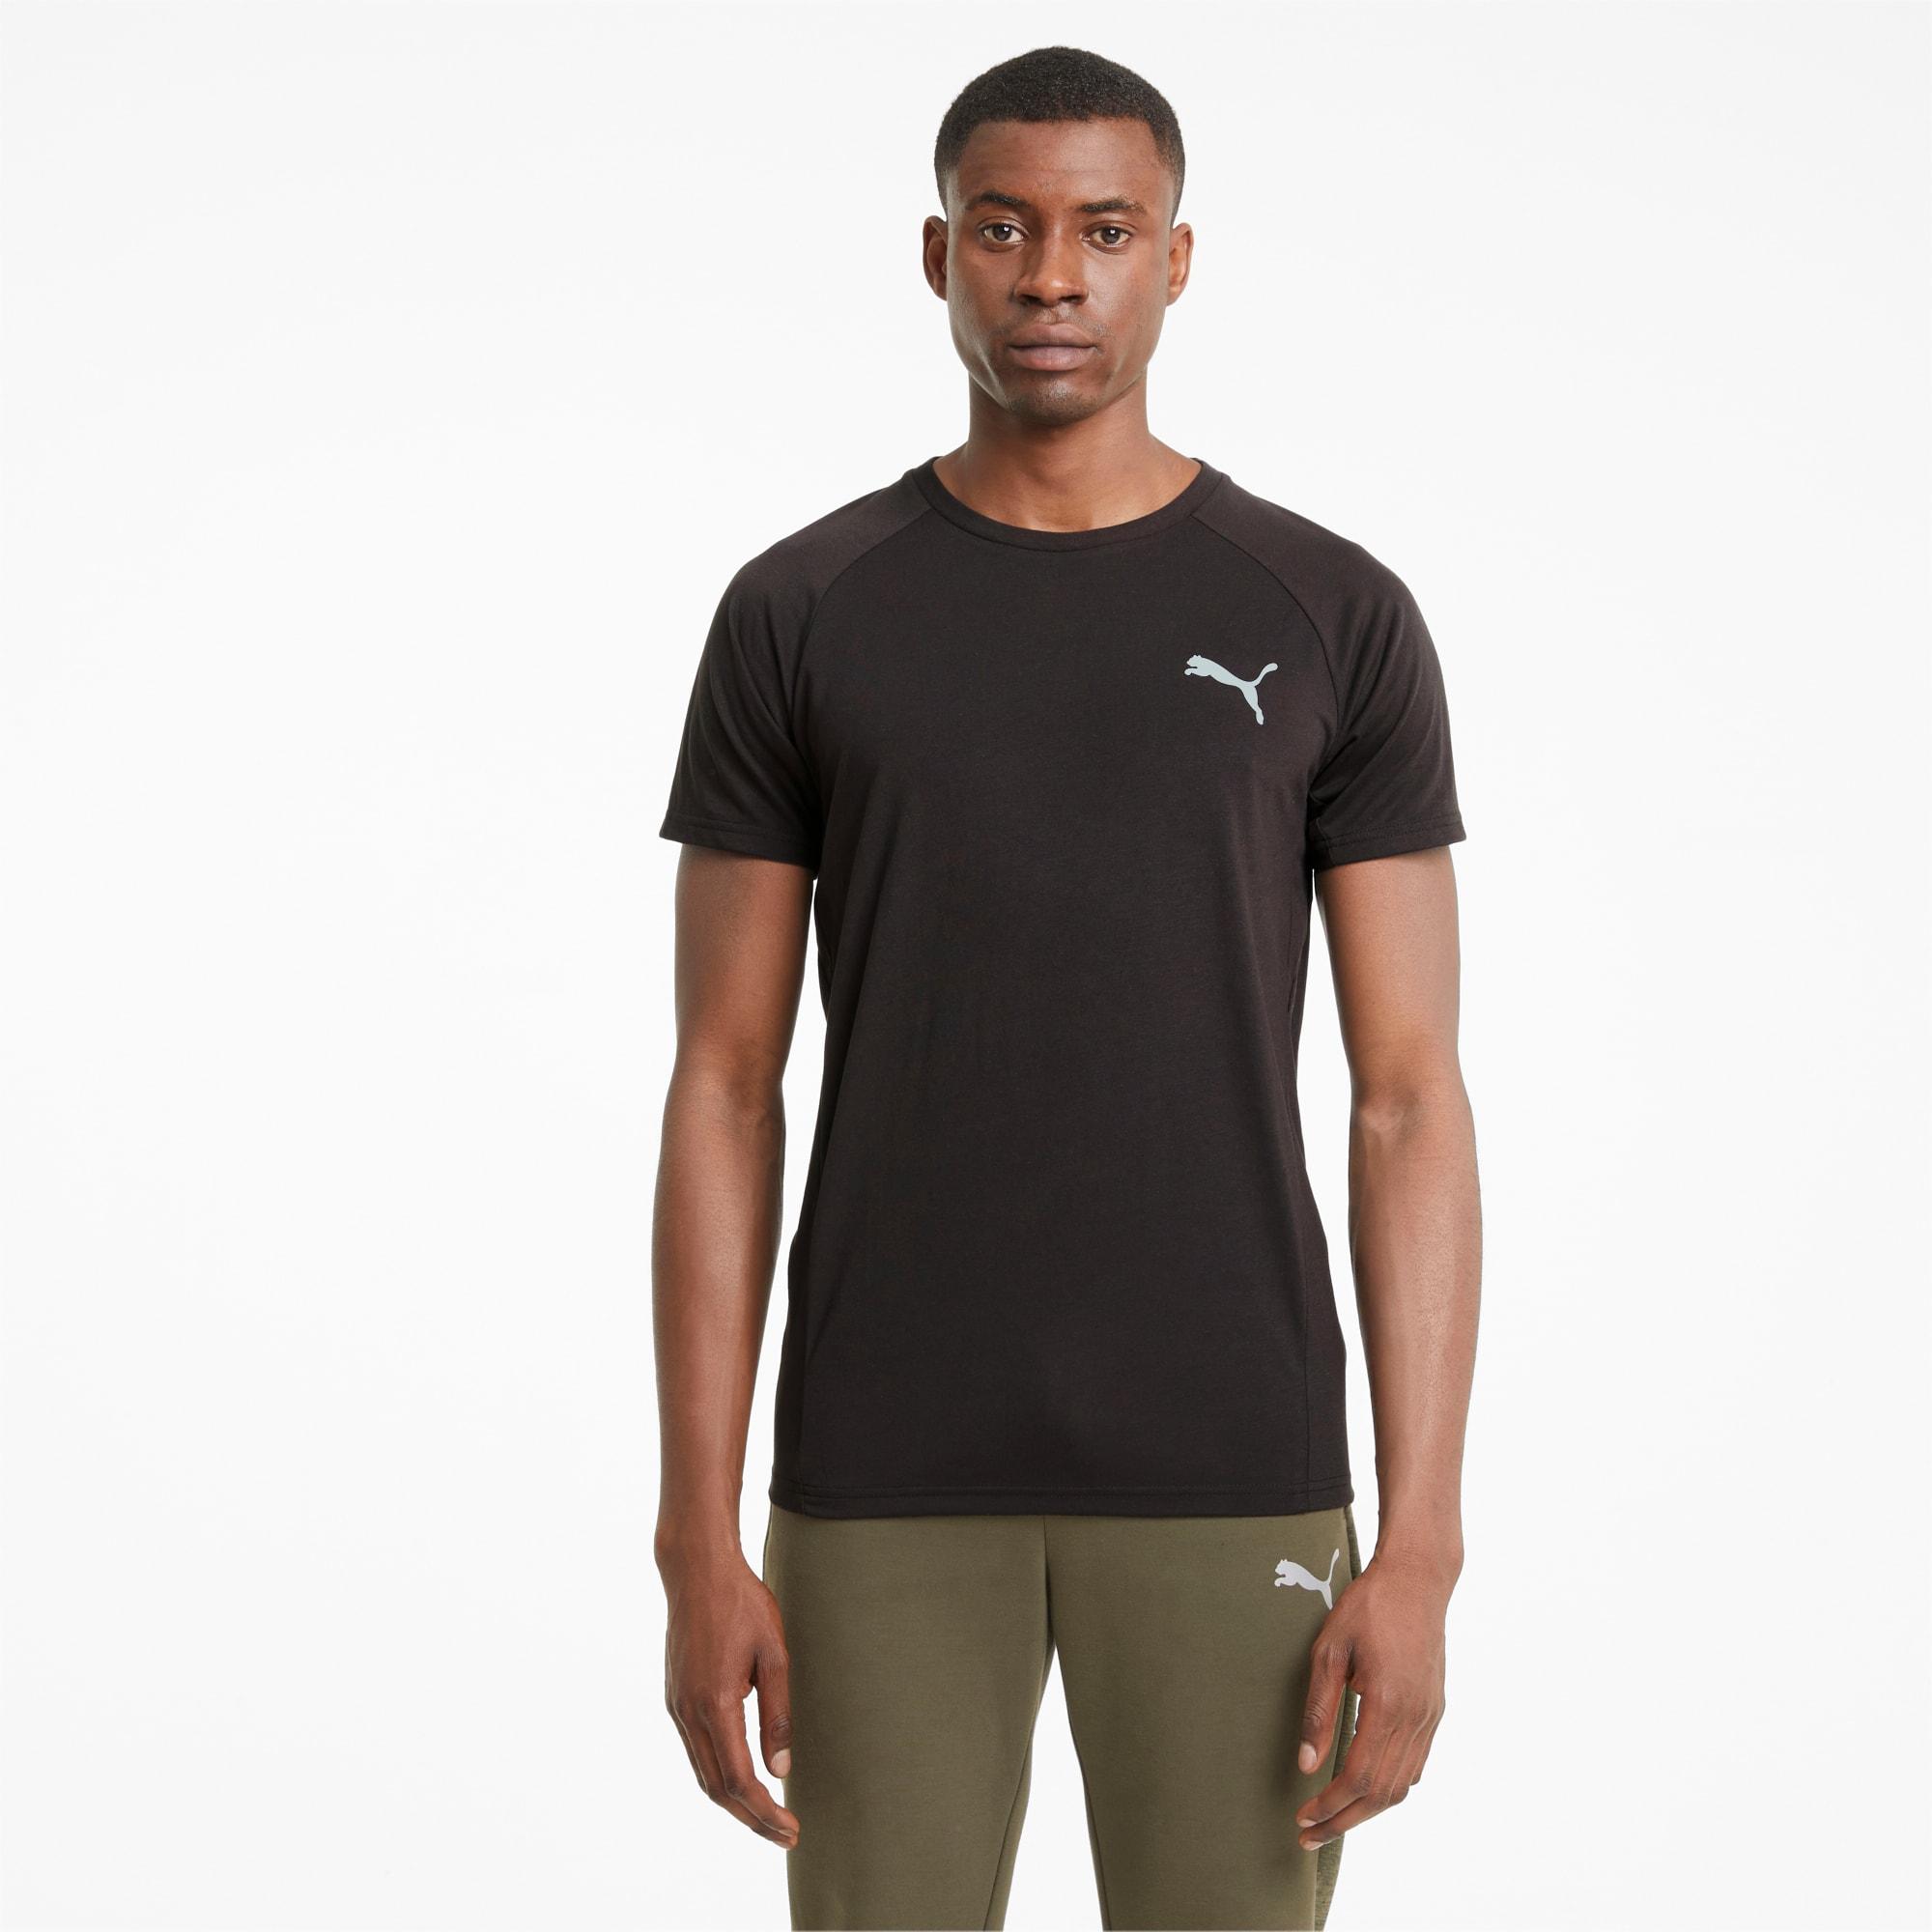 T-shirt Evostripe homme